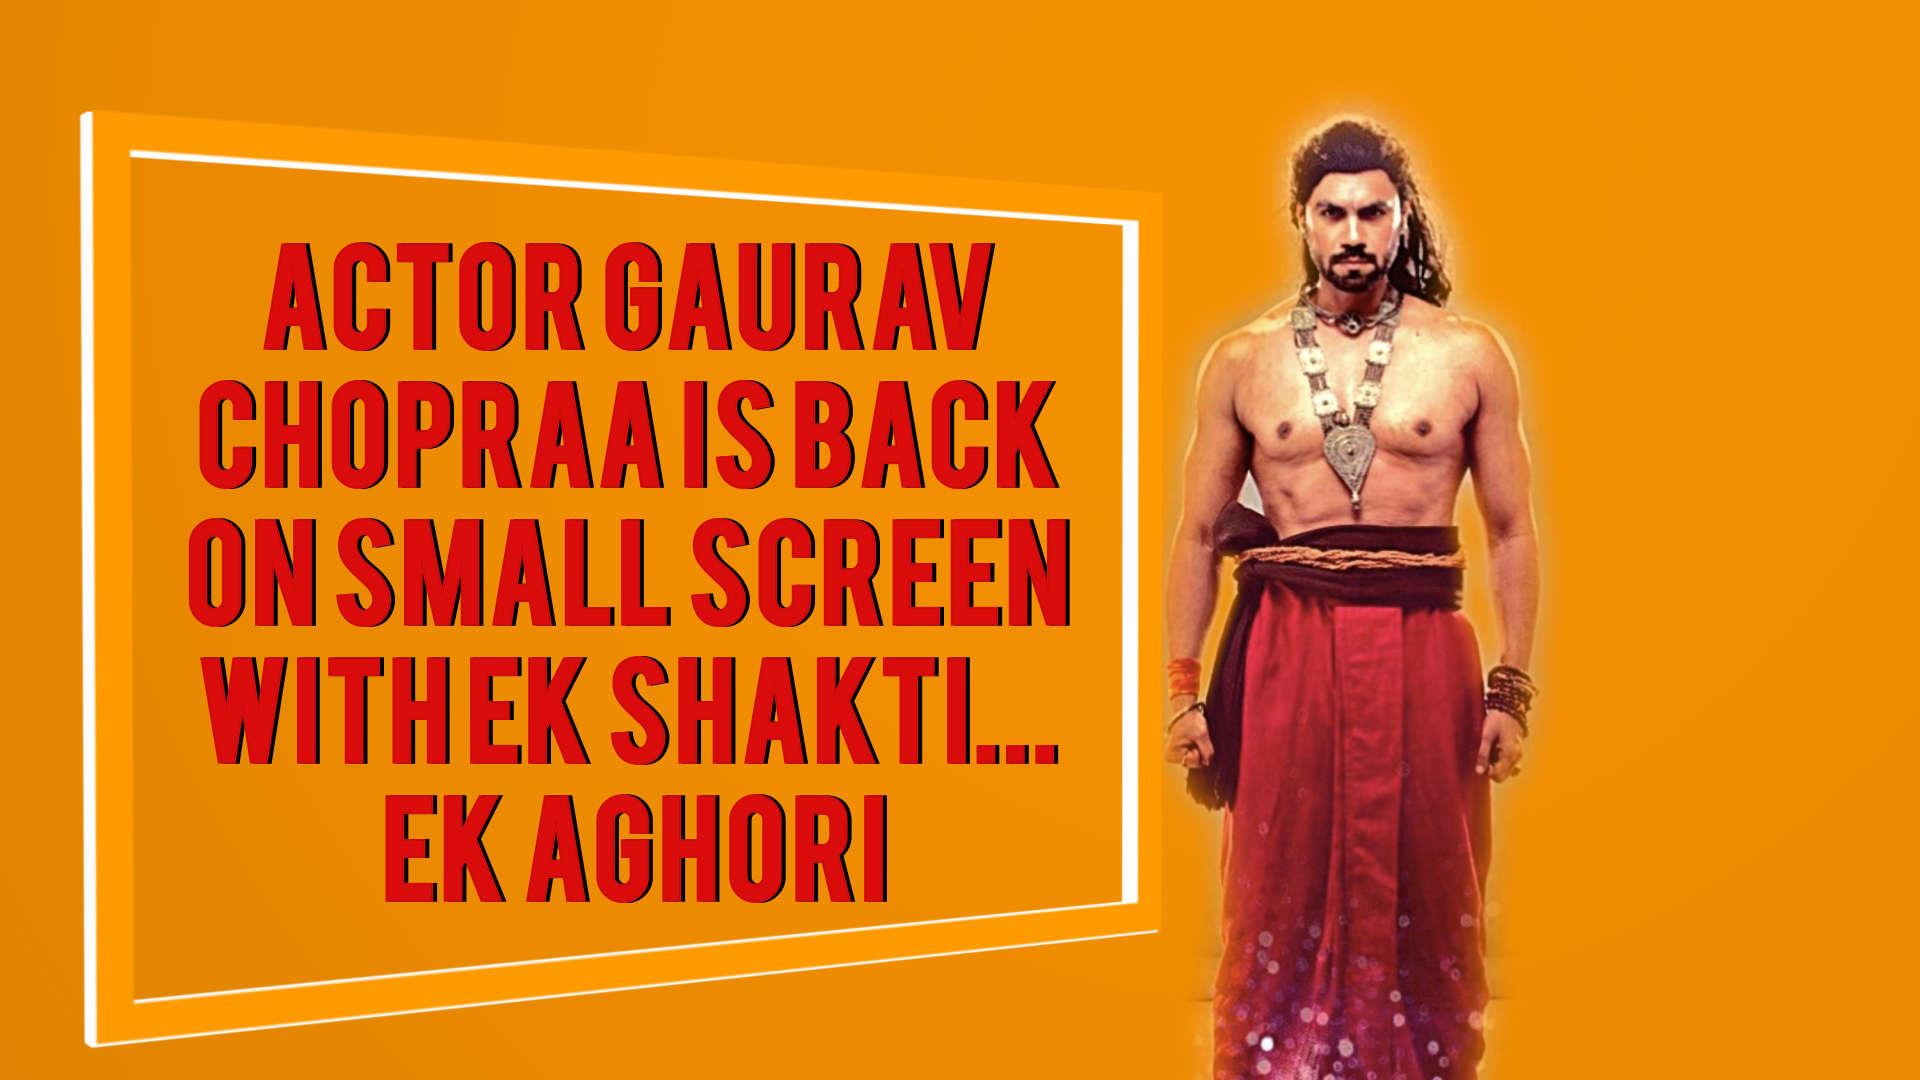 Actor Gaurav Chopraa is back on small screen with 'Ek Shakti    Ek Aghori'